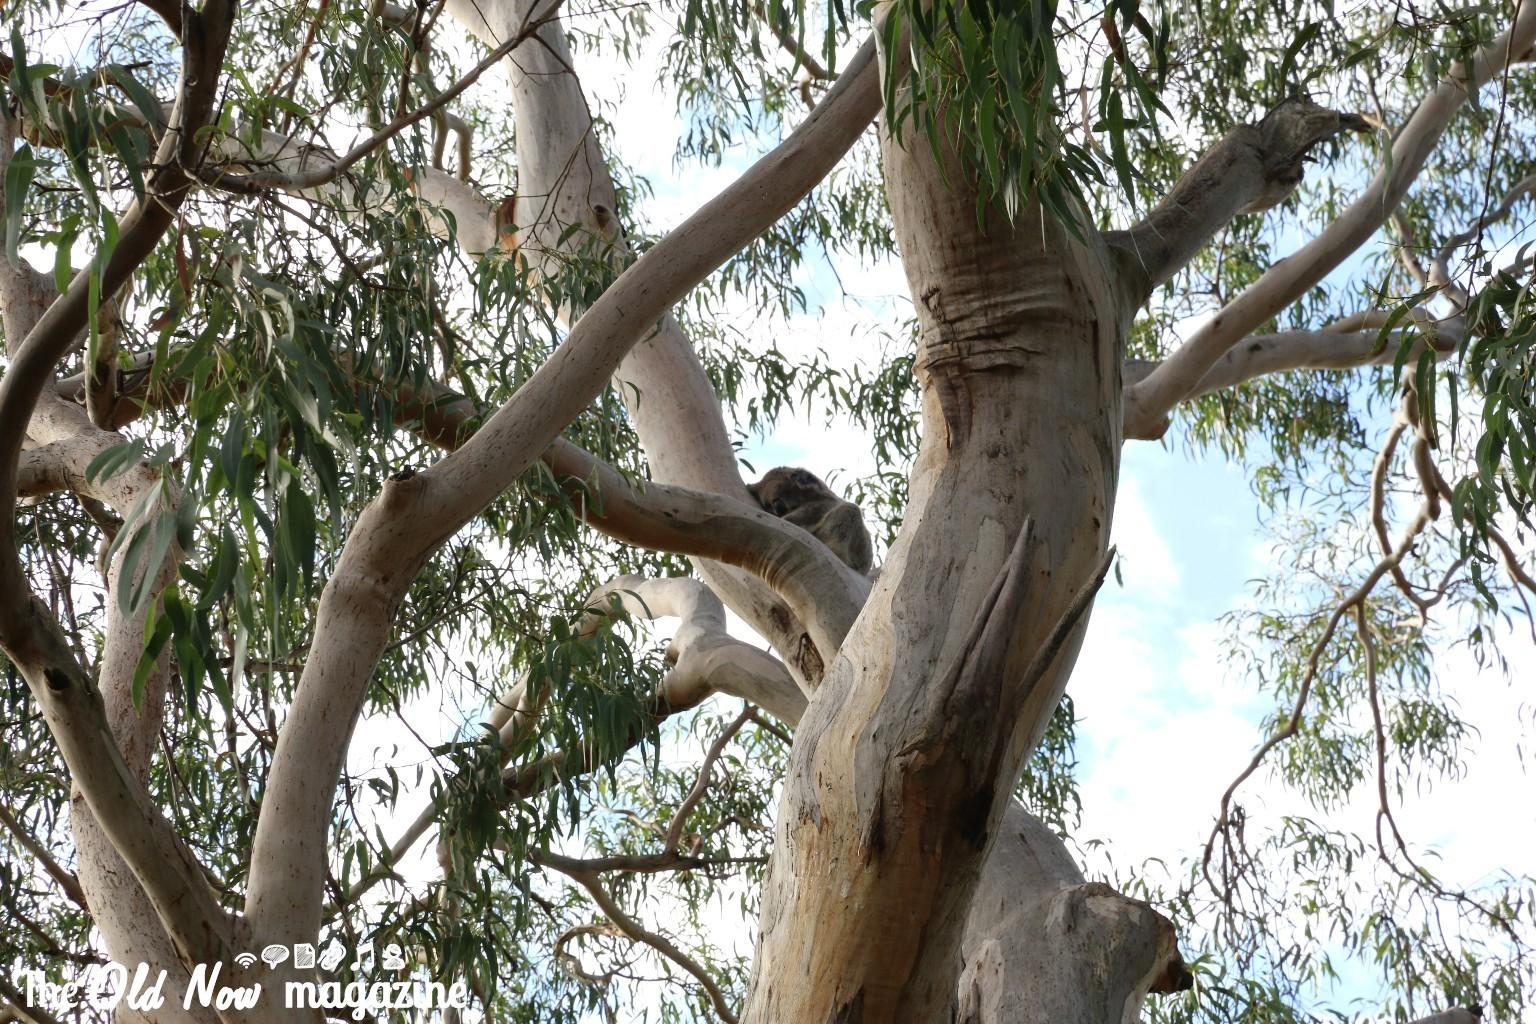 Koala Conservation Centre THEOLDNOW (9)